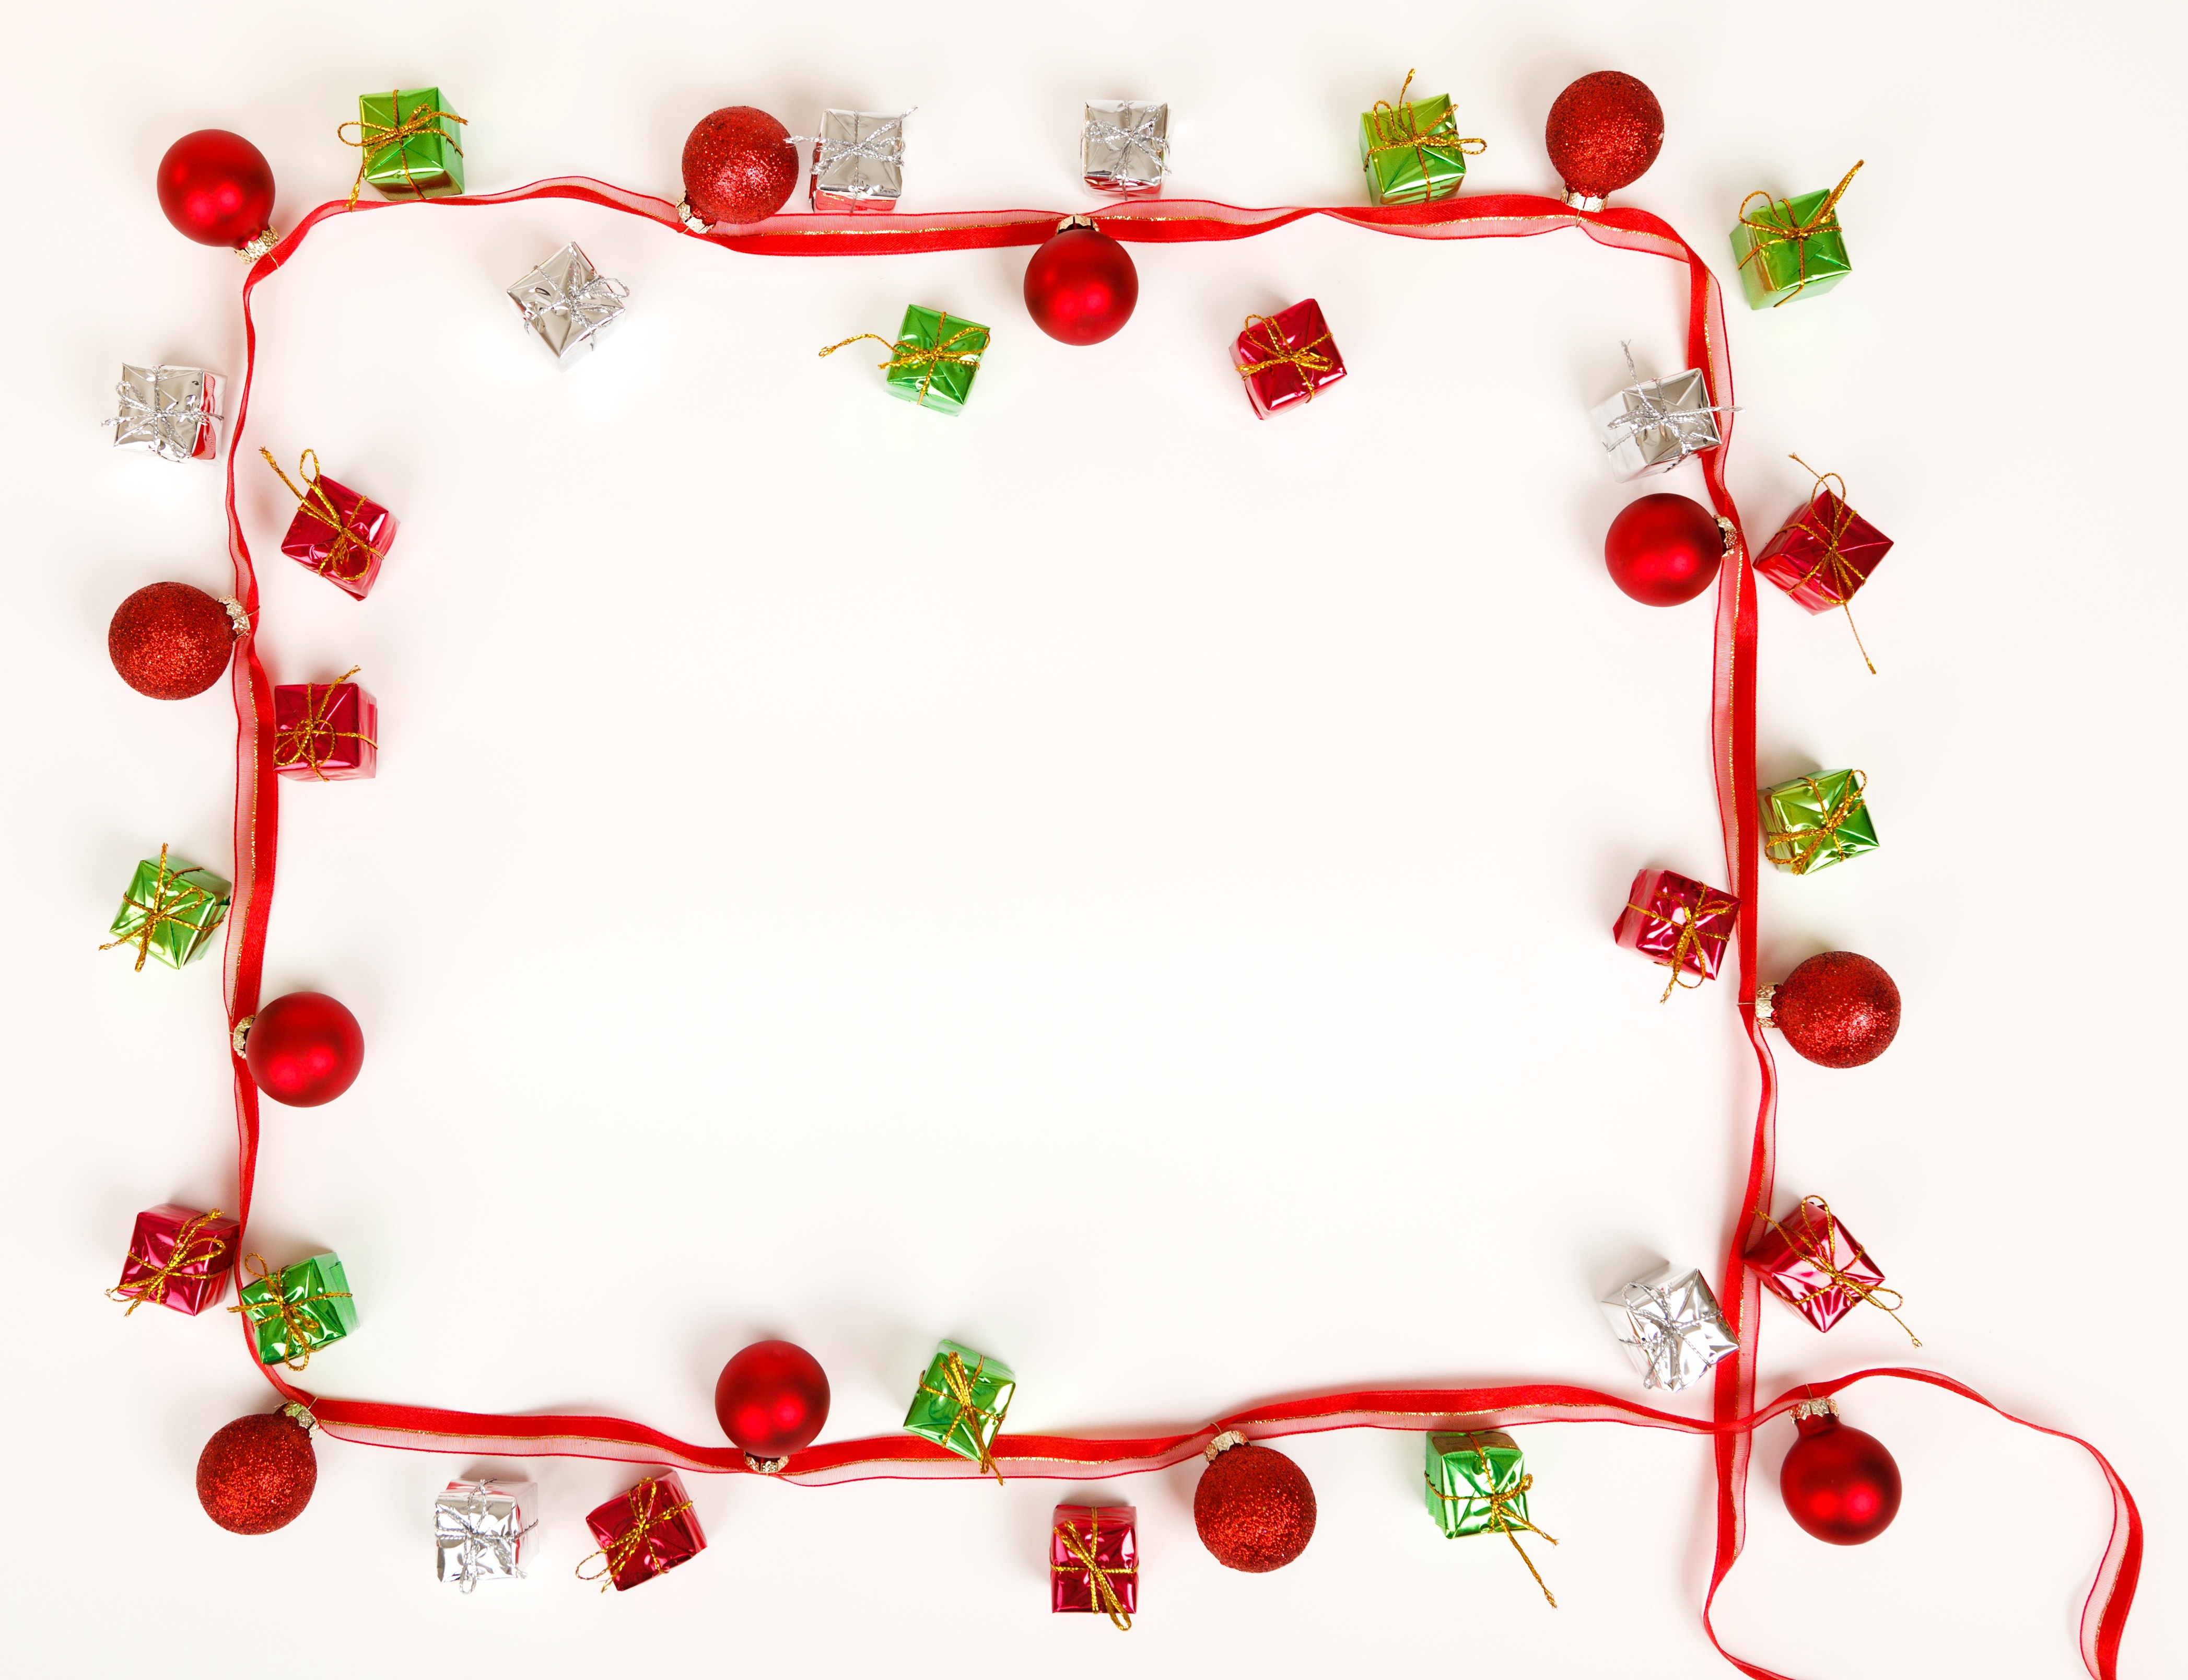 Christmas frame border - Photopublicdomain.com